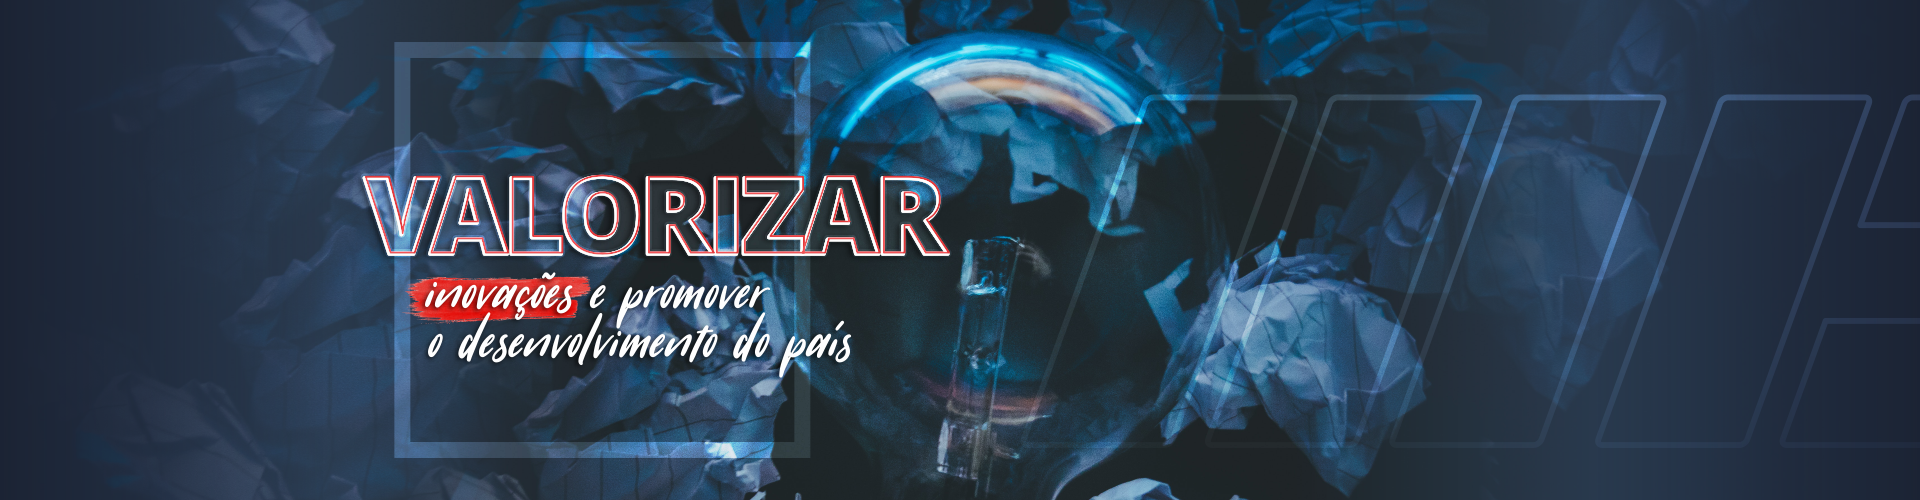 Valorizar_Inovação